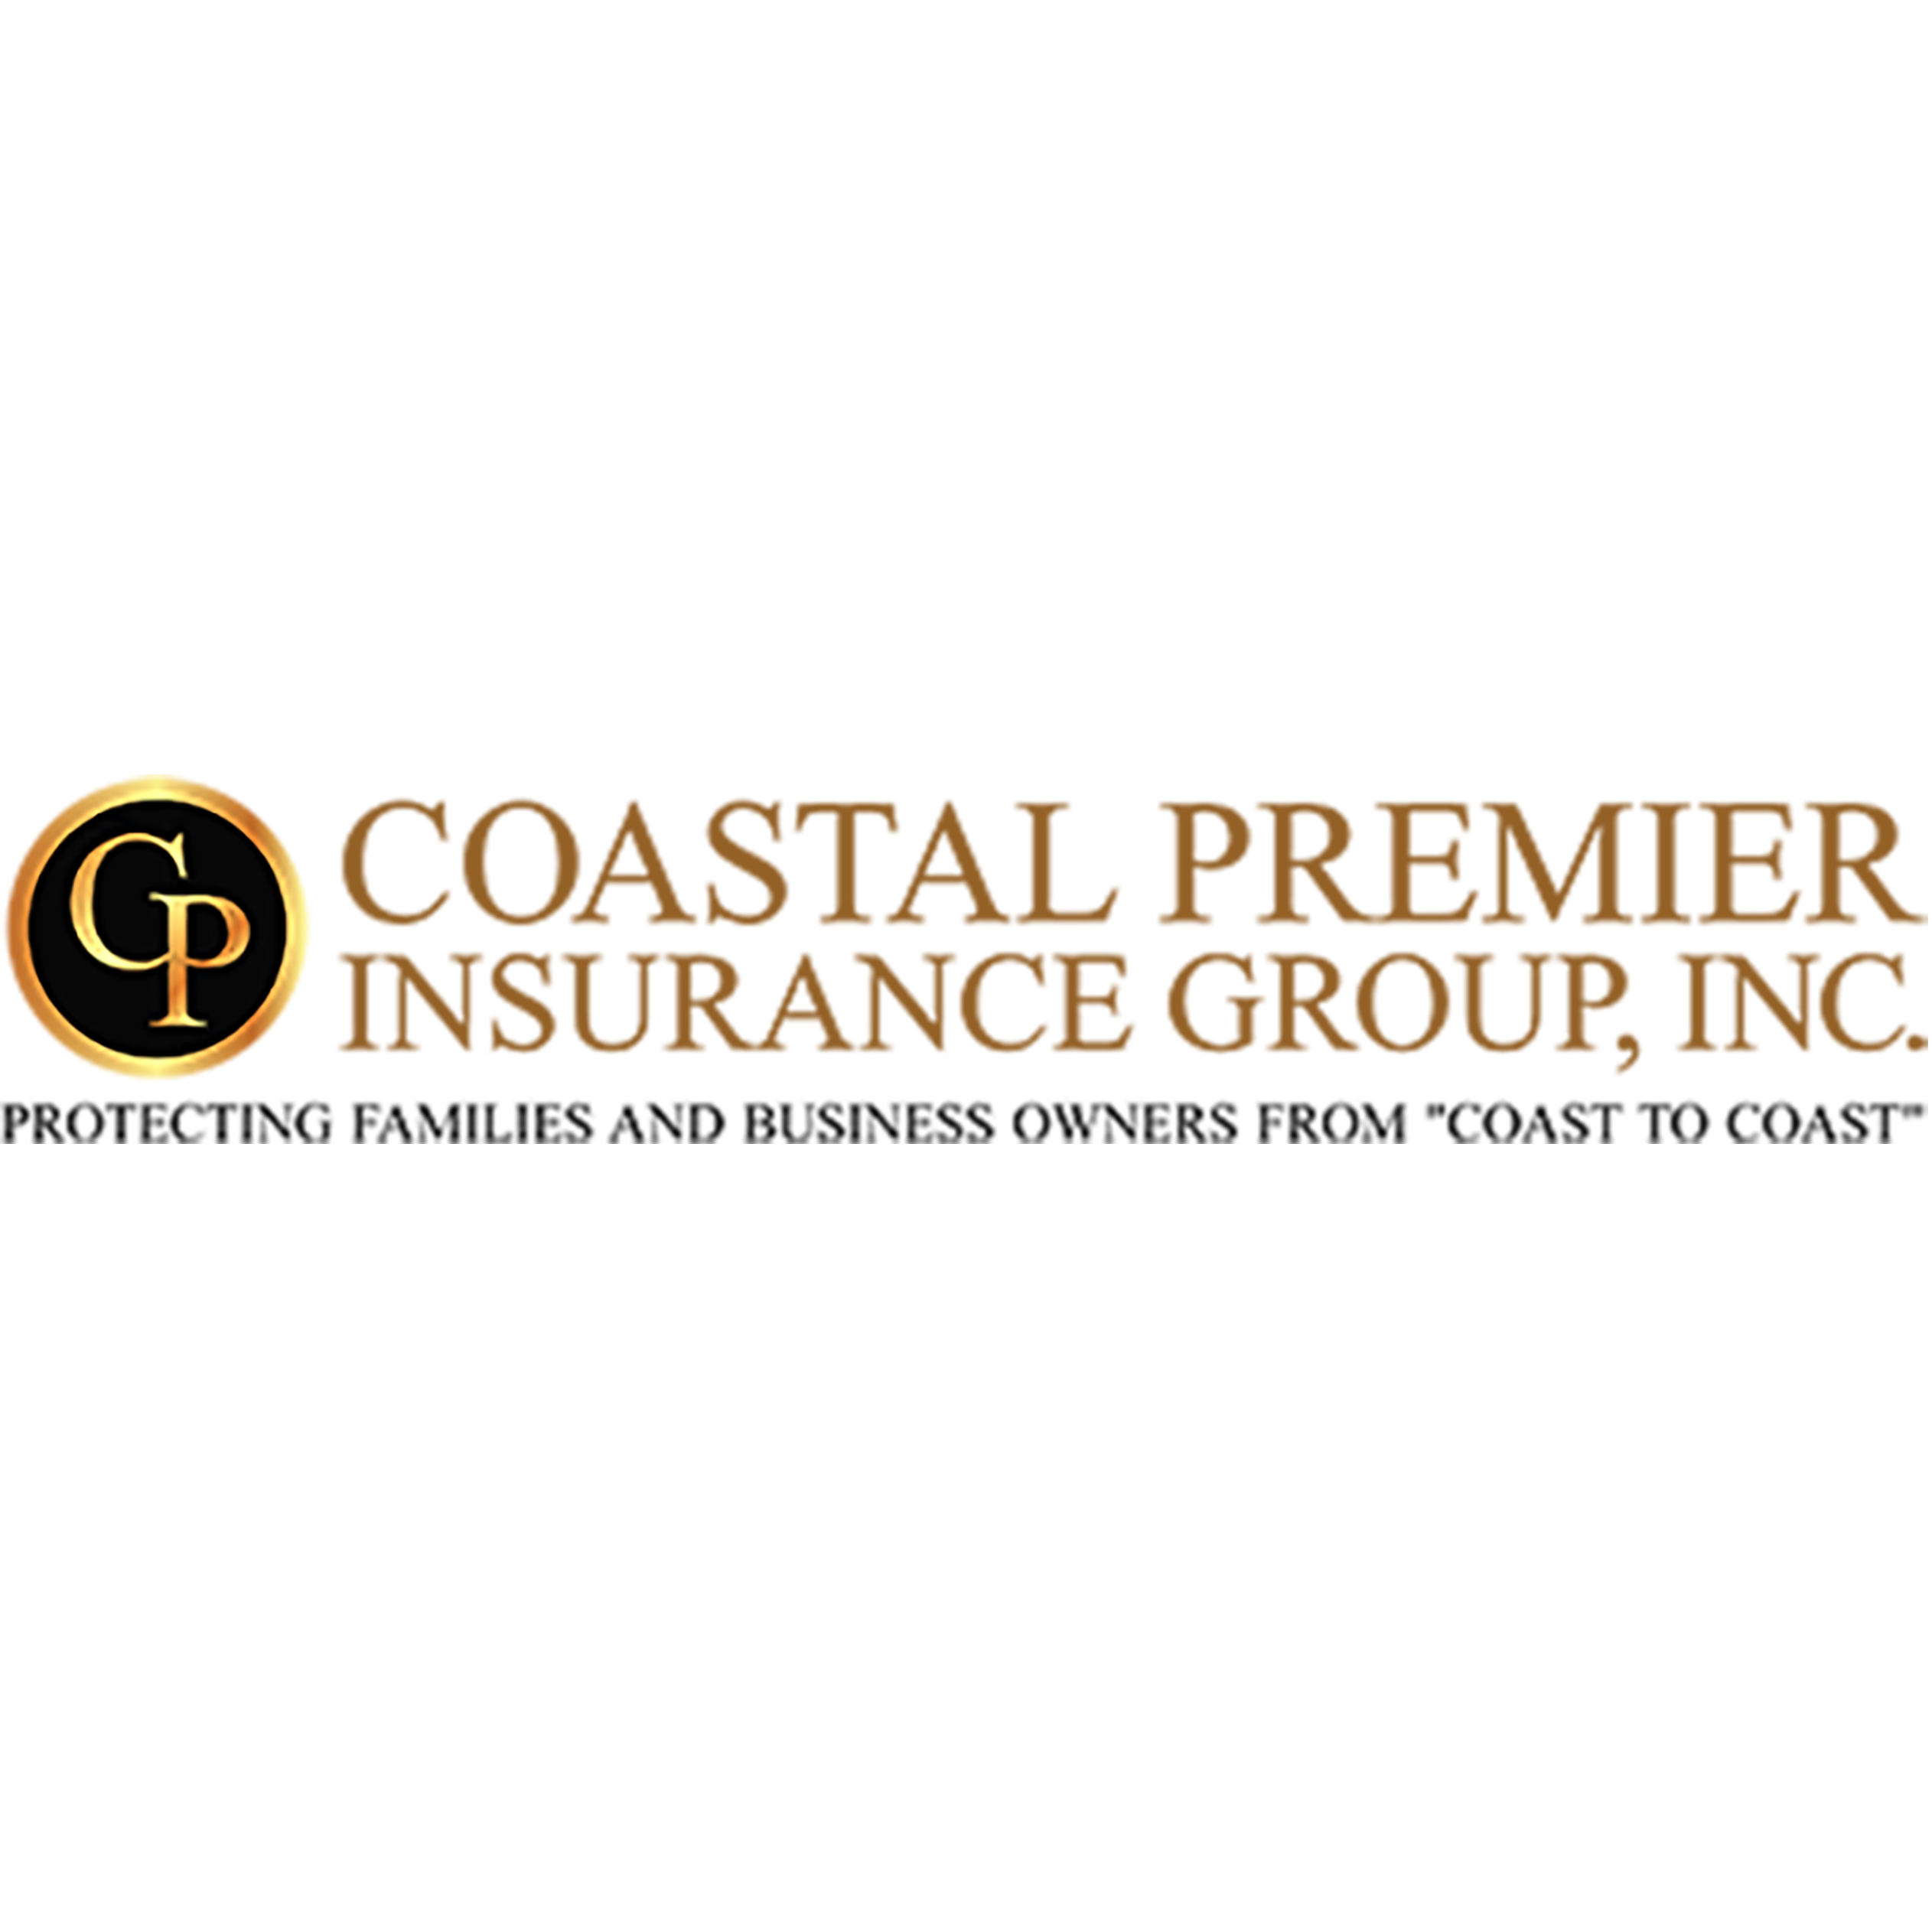 Coastal Premier Insurance Group, Inc.